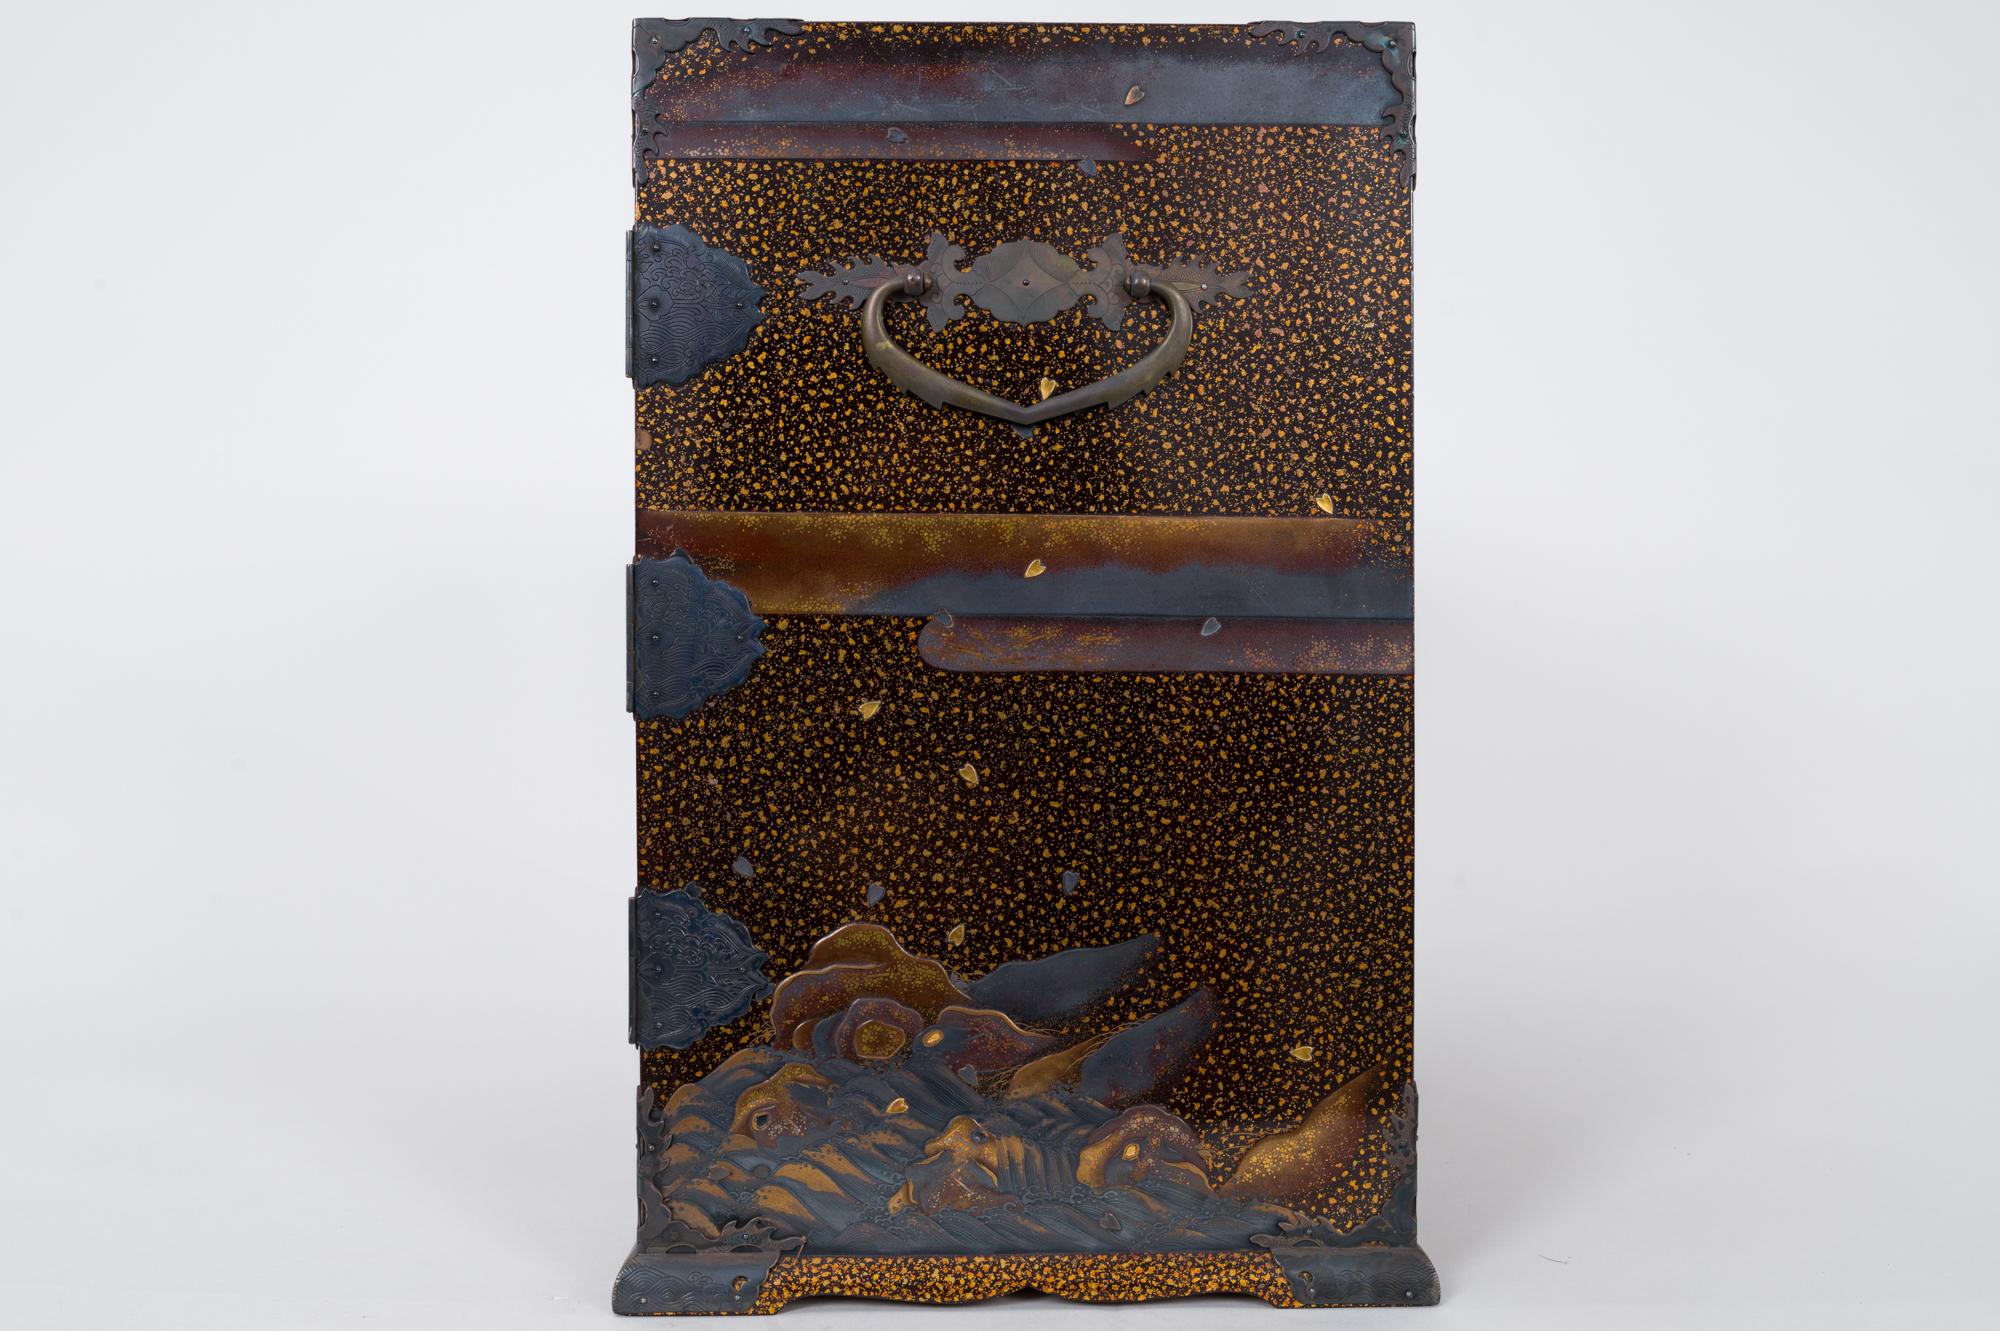 Japanese lacquer, Japanese antique, antique lacquer, Japanese antique lacquer, Japanese art